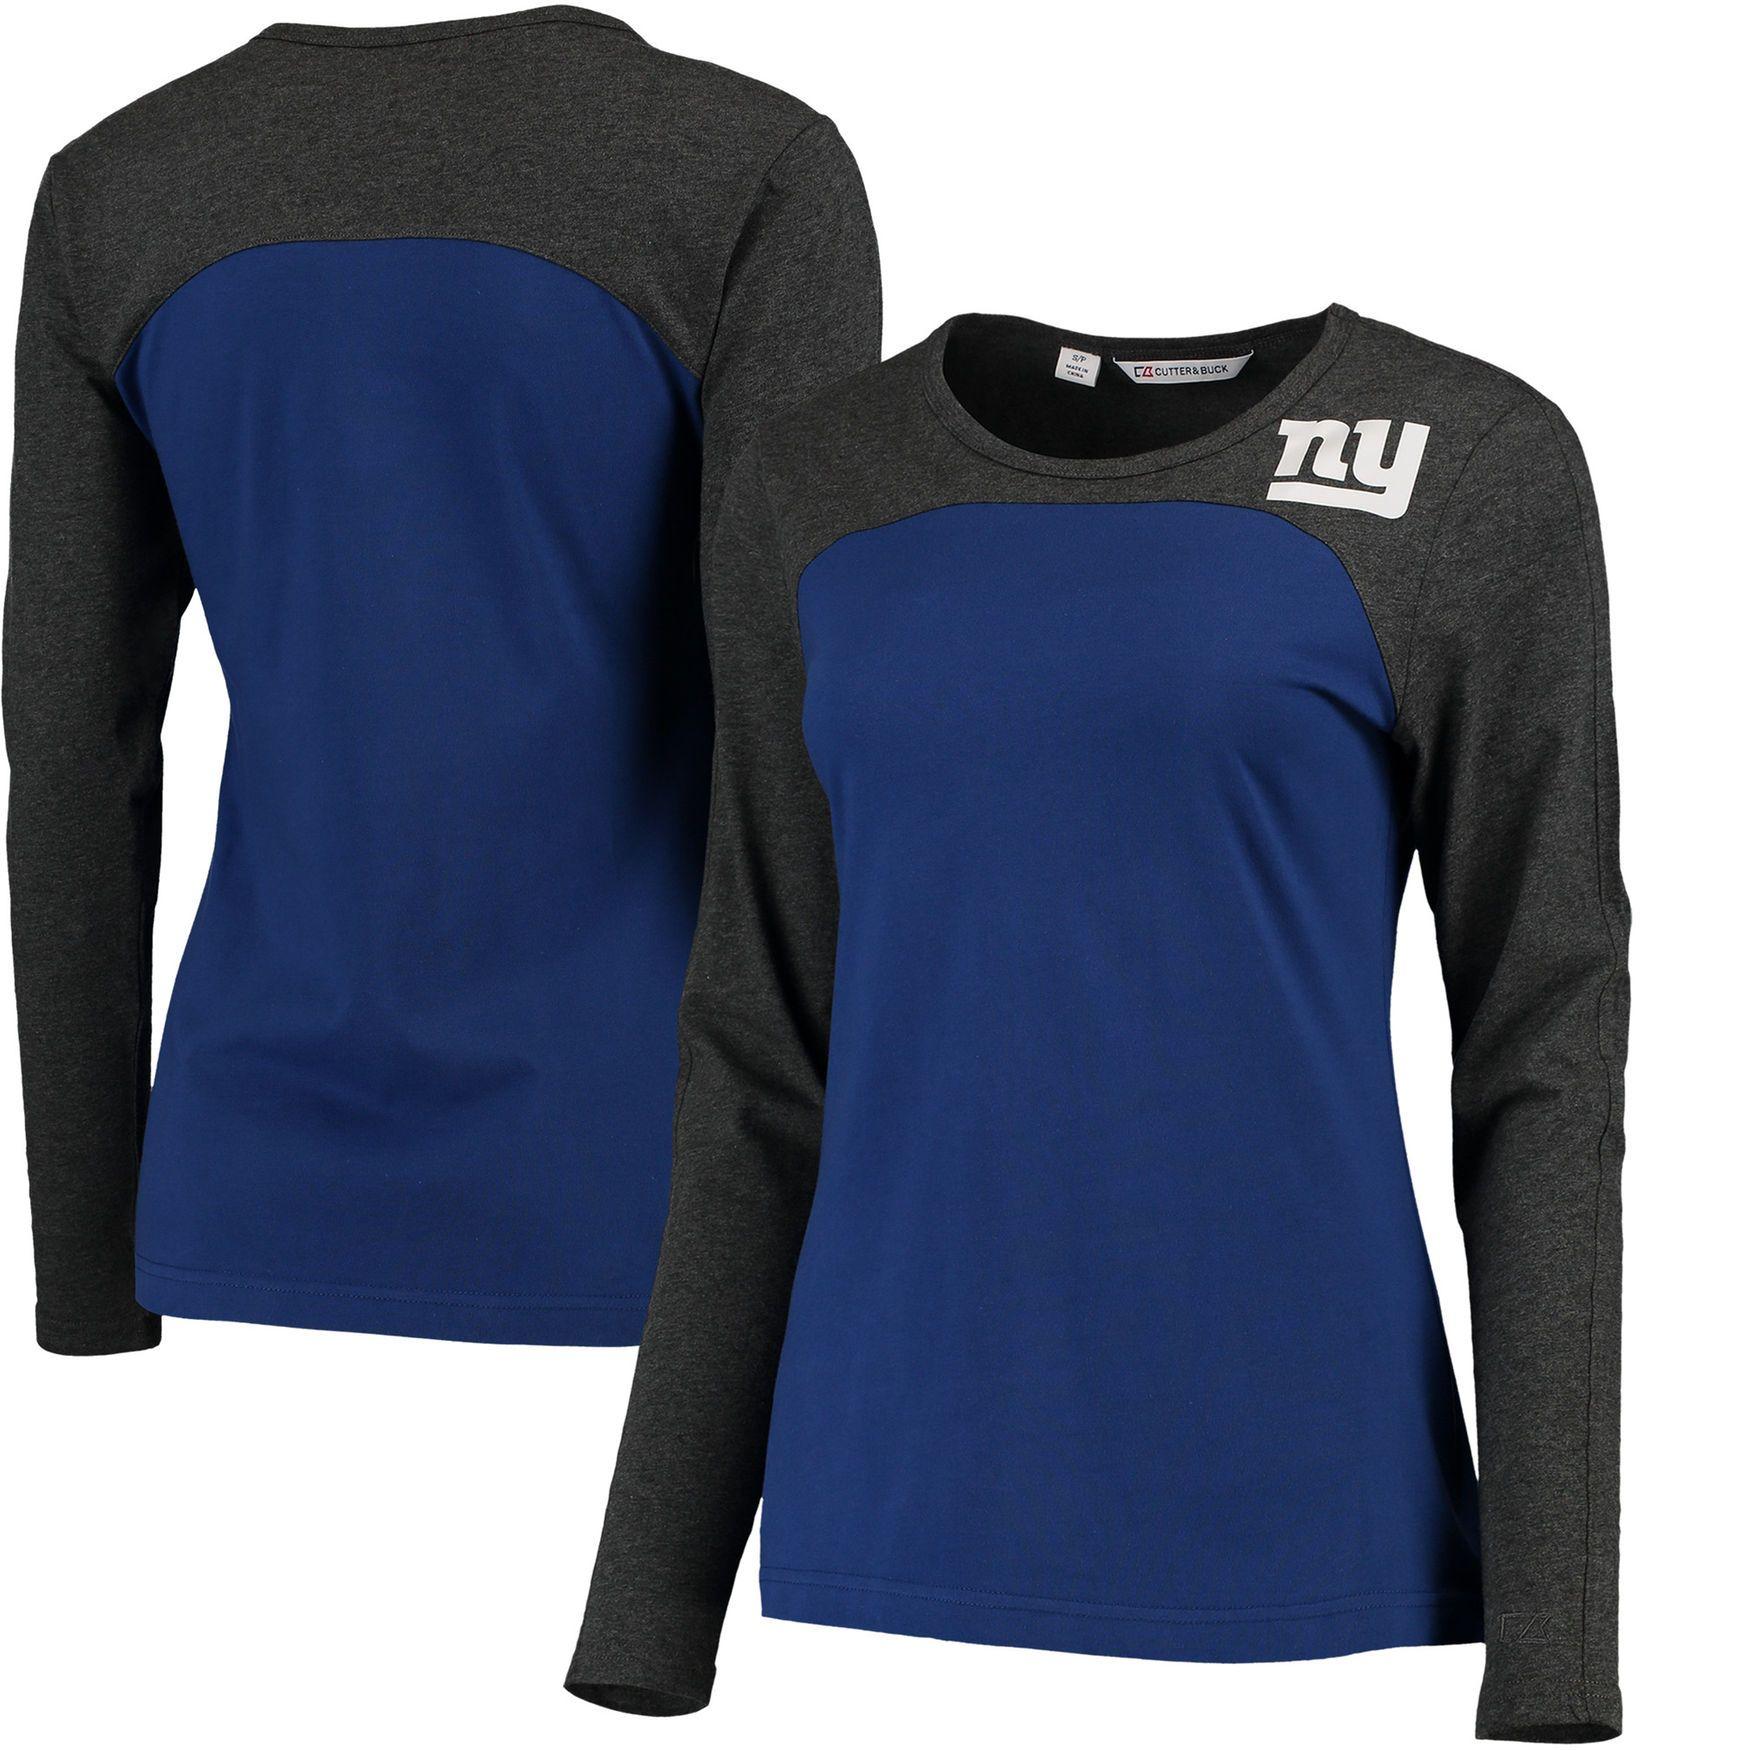 1e57c8a4 Women's New York Giants Cutter & Buck Royal Compel Colorblock Long ...